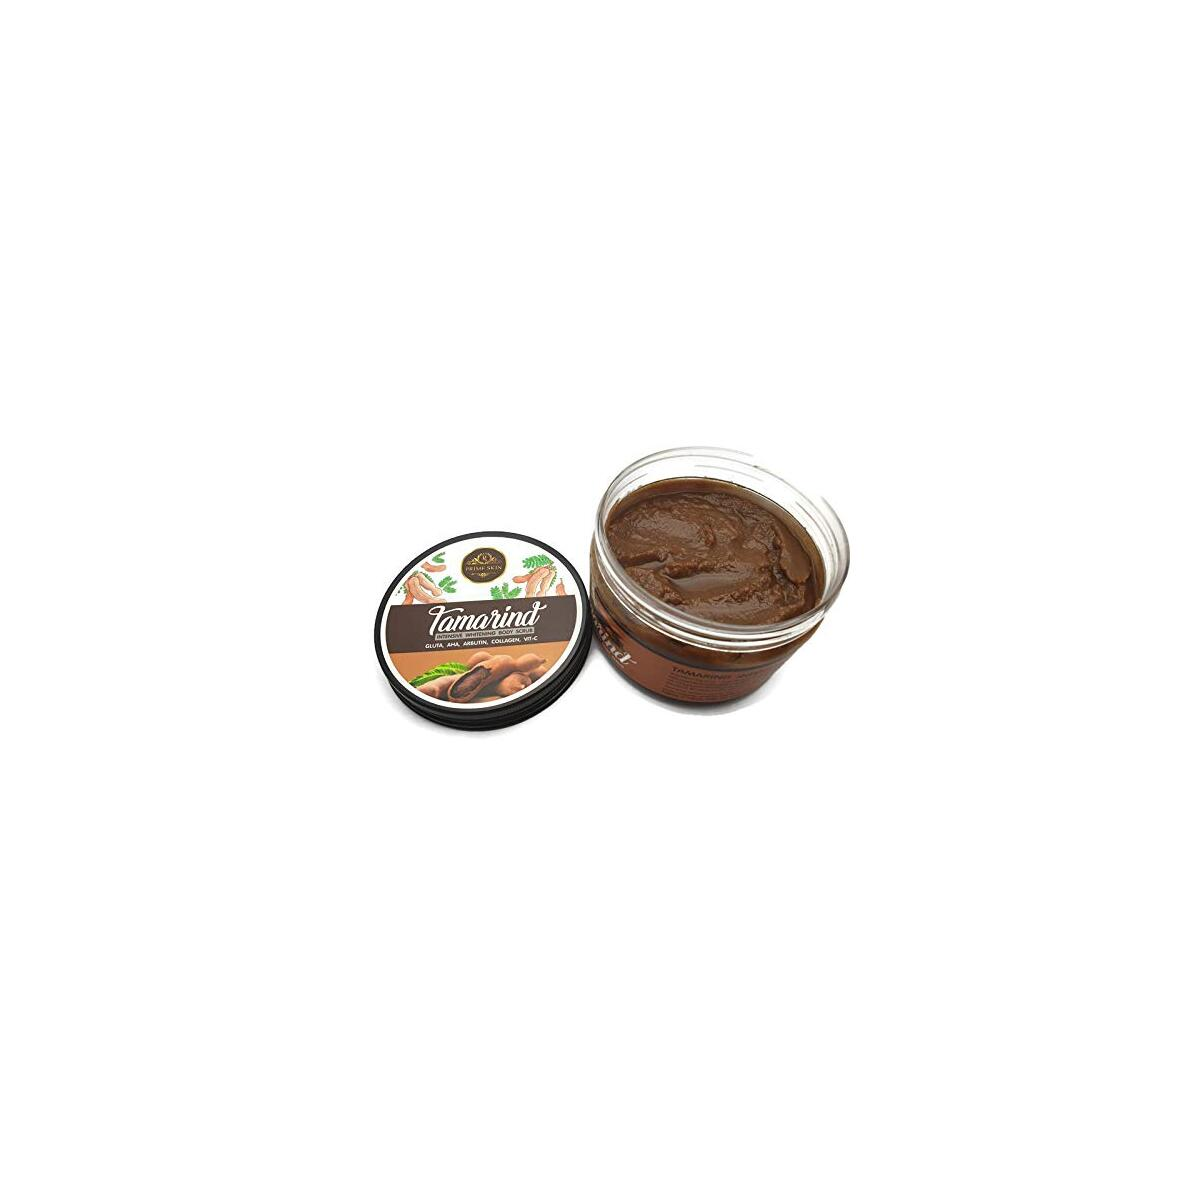 Prime Skin Intensive Whitening Body Scrub 300 grams Gluta, AHA, Alpha Arbutin, Collagen, Vitamin C (Tamarind)